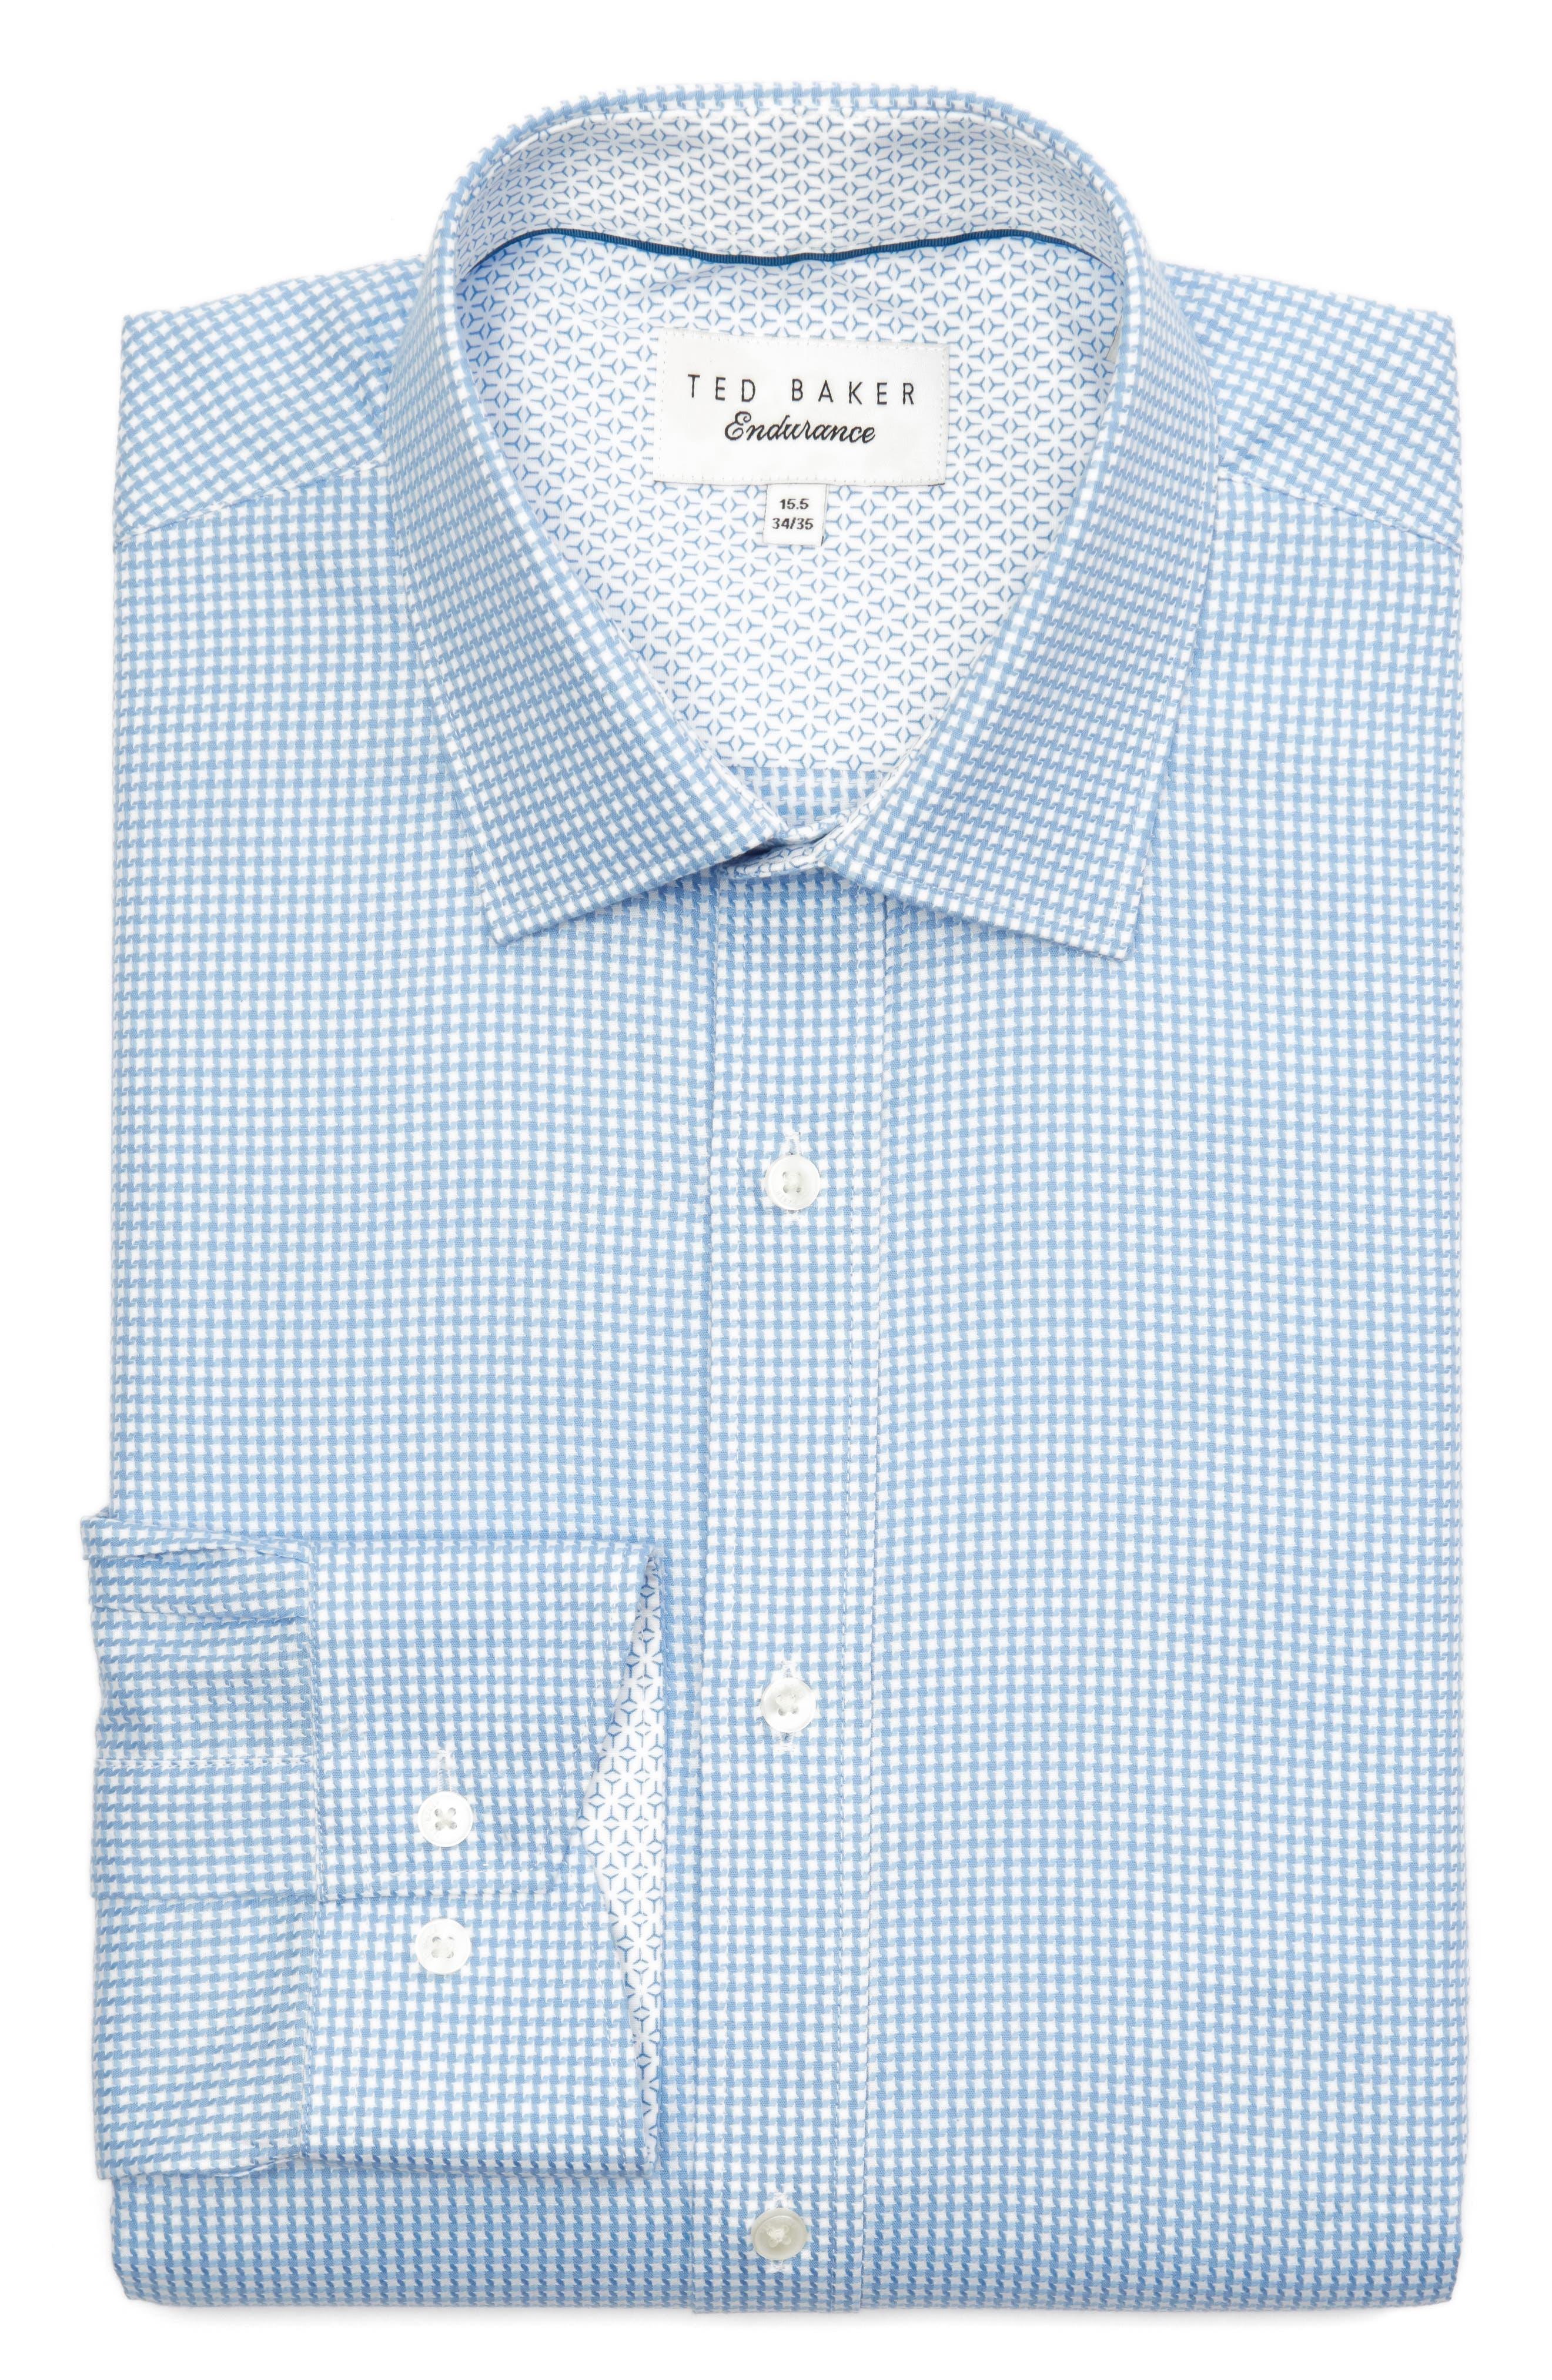 Jaiden Trim Fit Houndstooth Dress Shirt,                             Alternate thumbnail 5, color,                             450